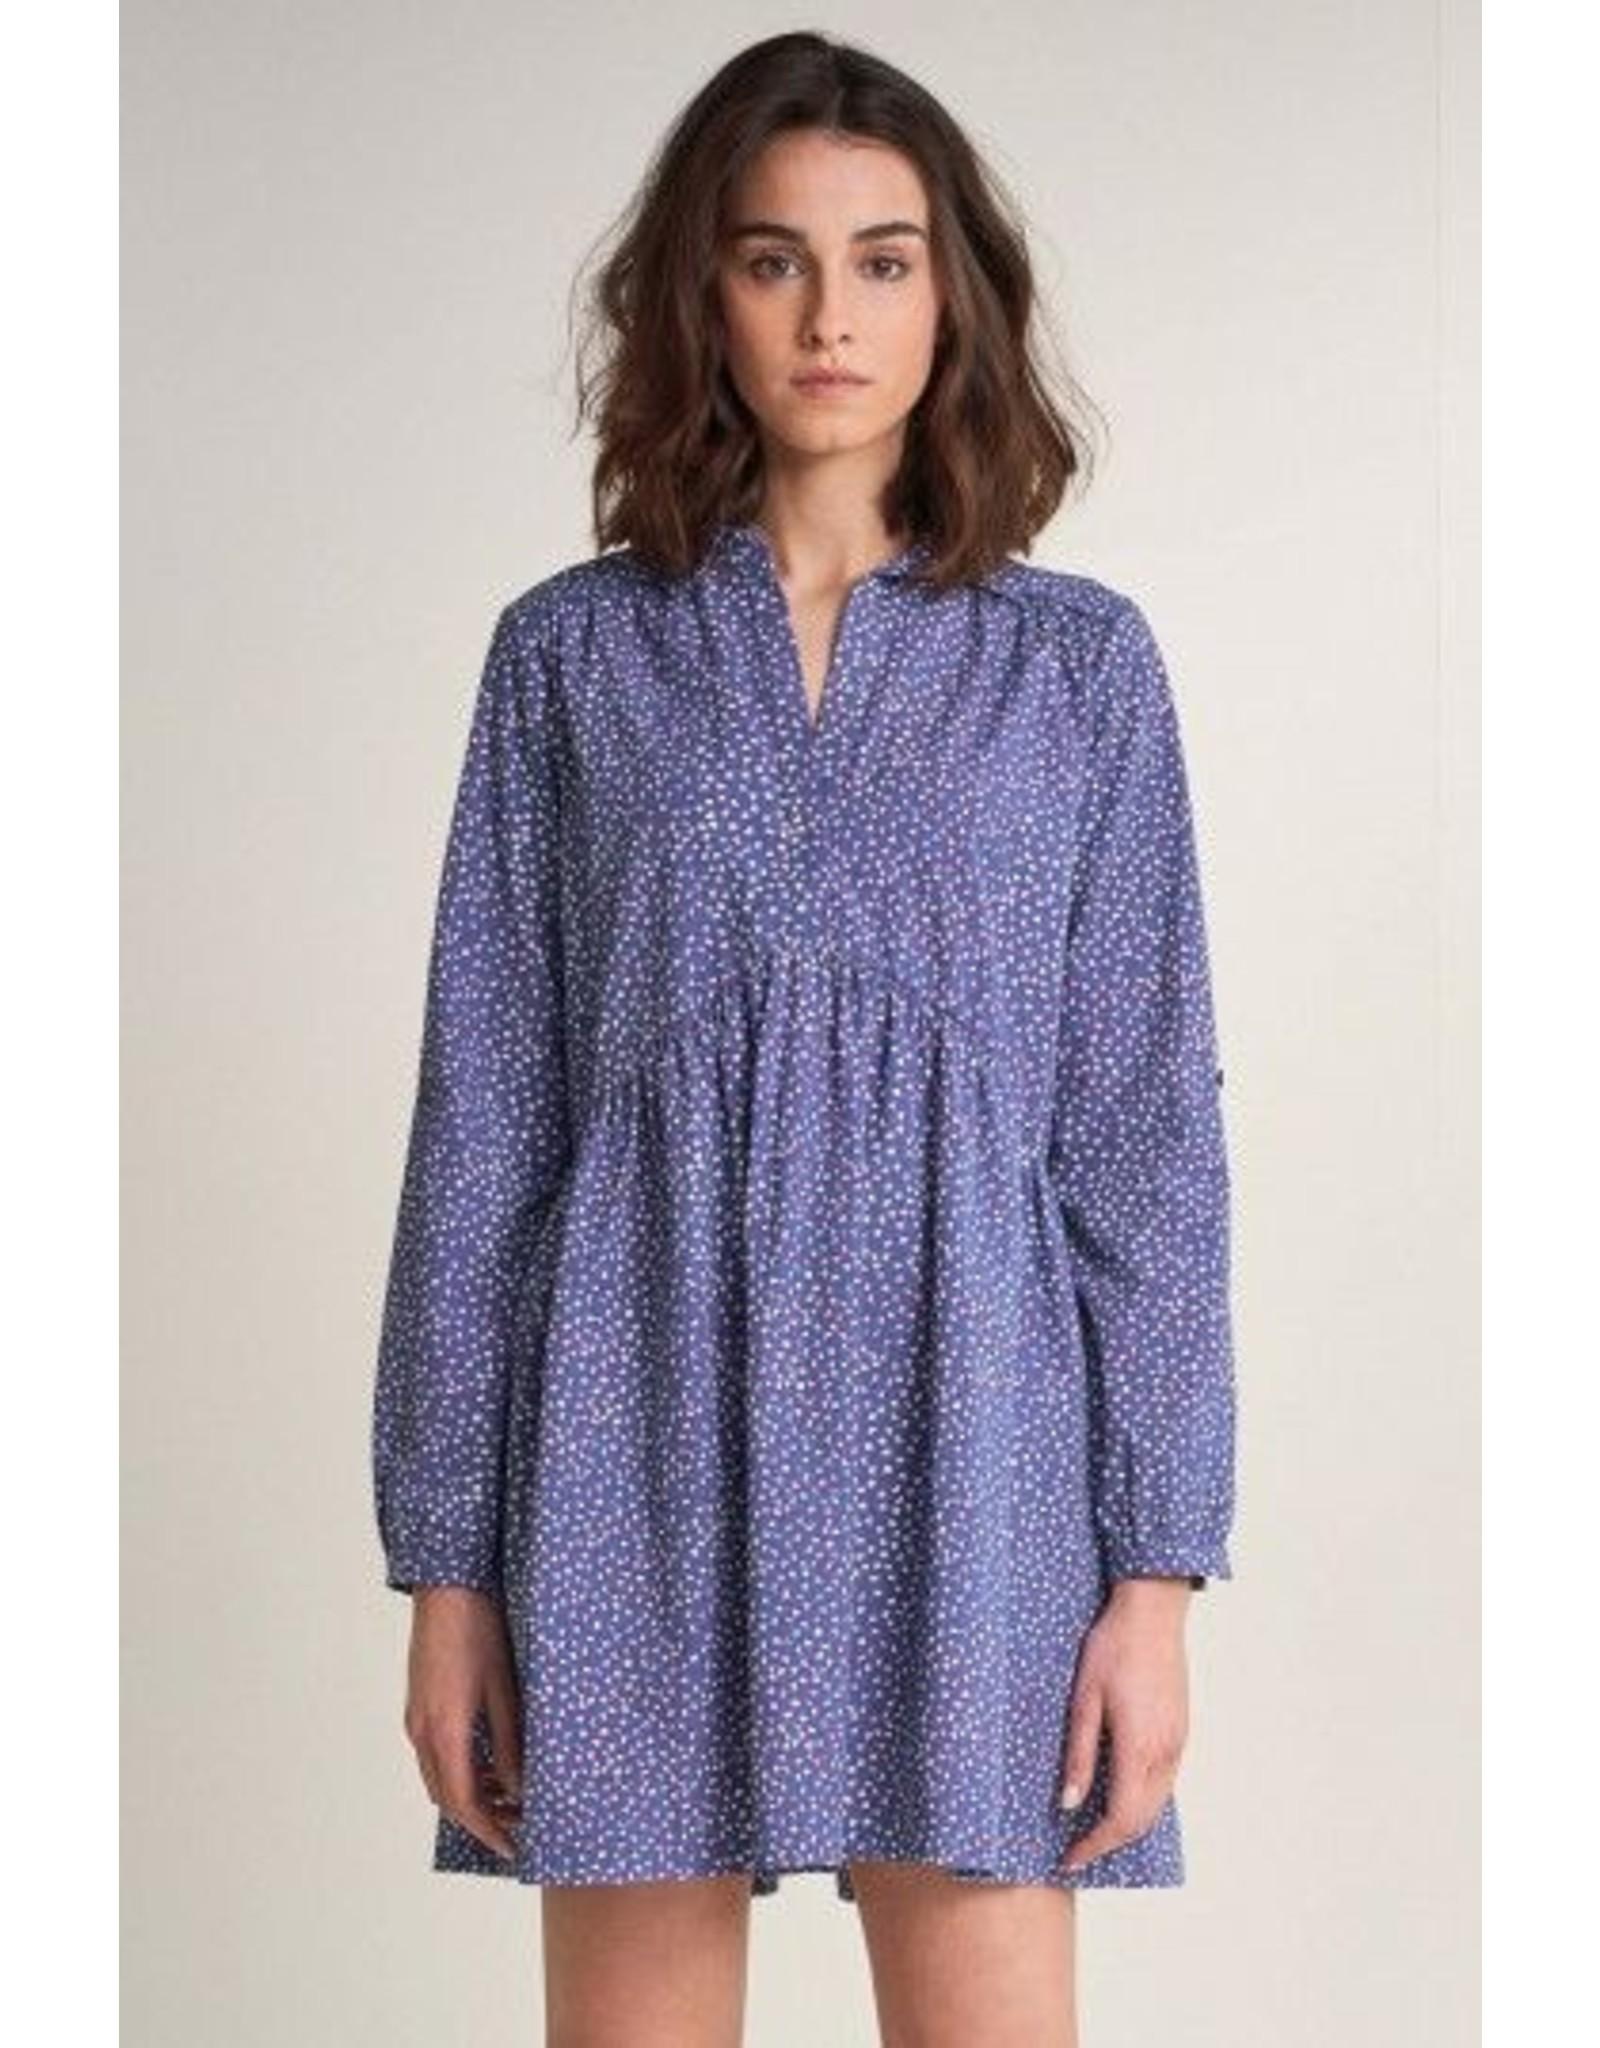 Salsa Jeans Cotton Dress With Print Design